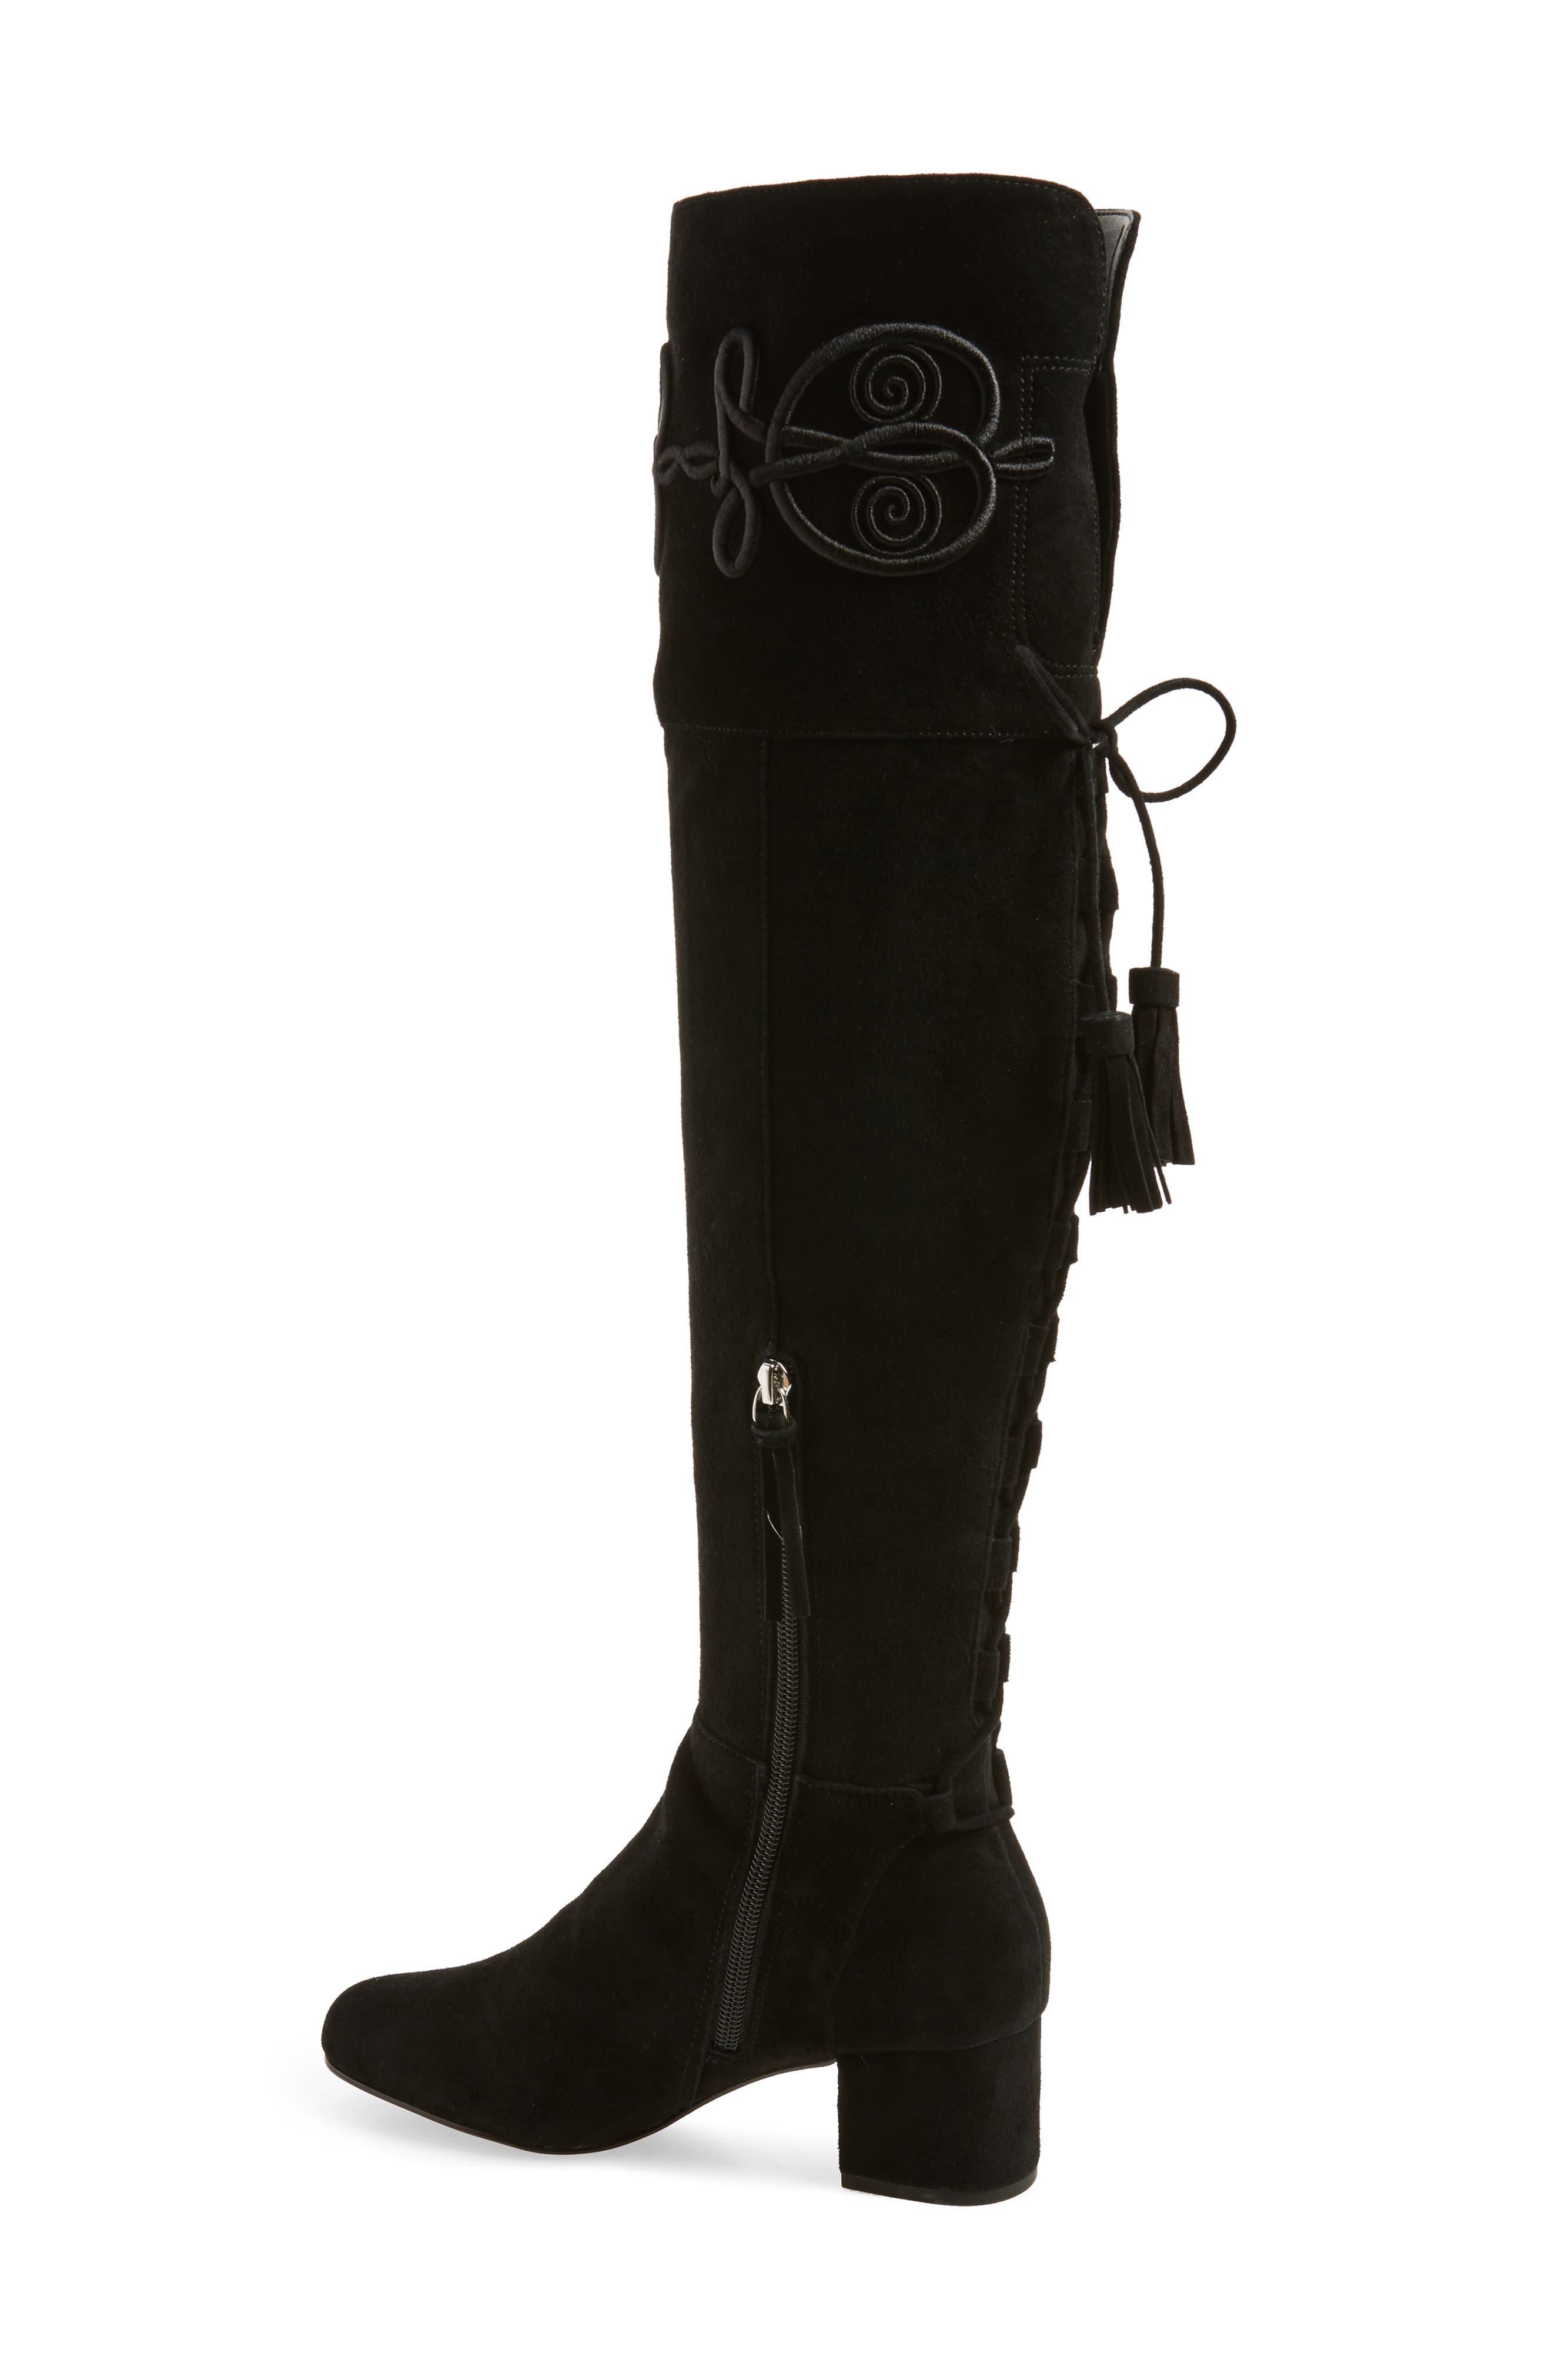 Alternate Image 2  - Rebecca Minkoff Shiloh Over the Knee Boot (Women) (Narrow Calf)